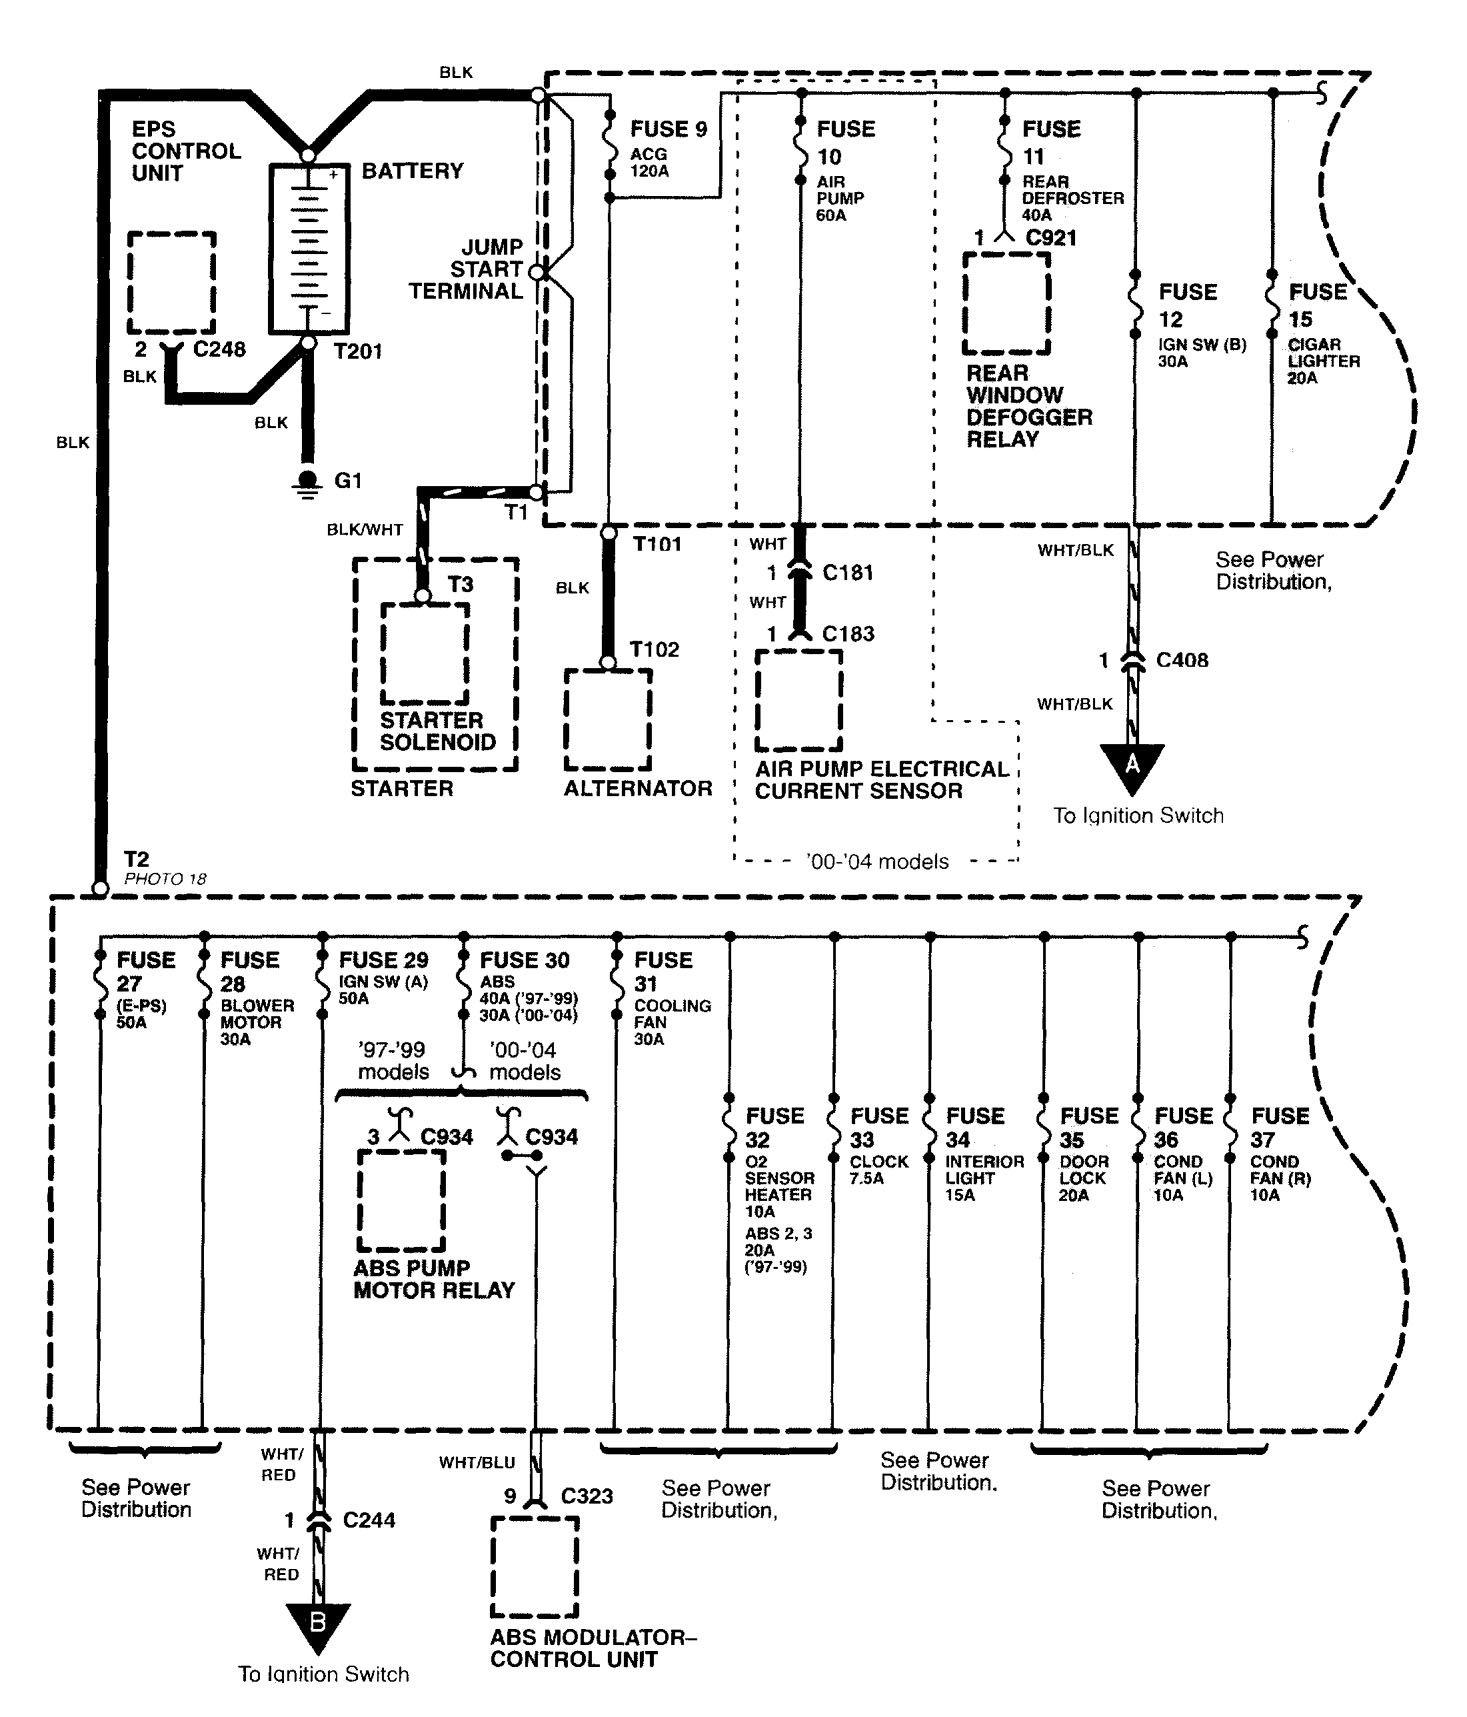 2004 F650 Wiring Diagram Power Distribution Schematics Fuse Box Acura Nsx 1997 Diagrams Ford